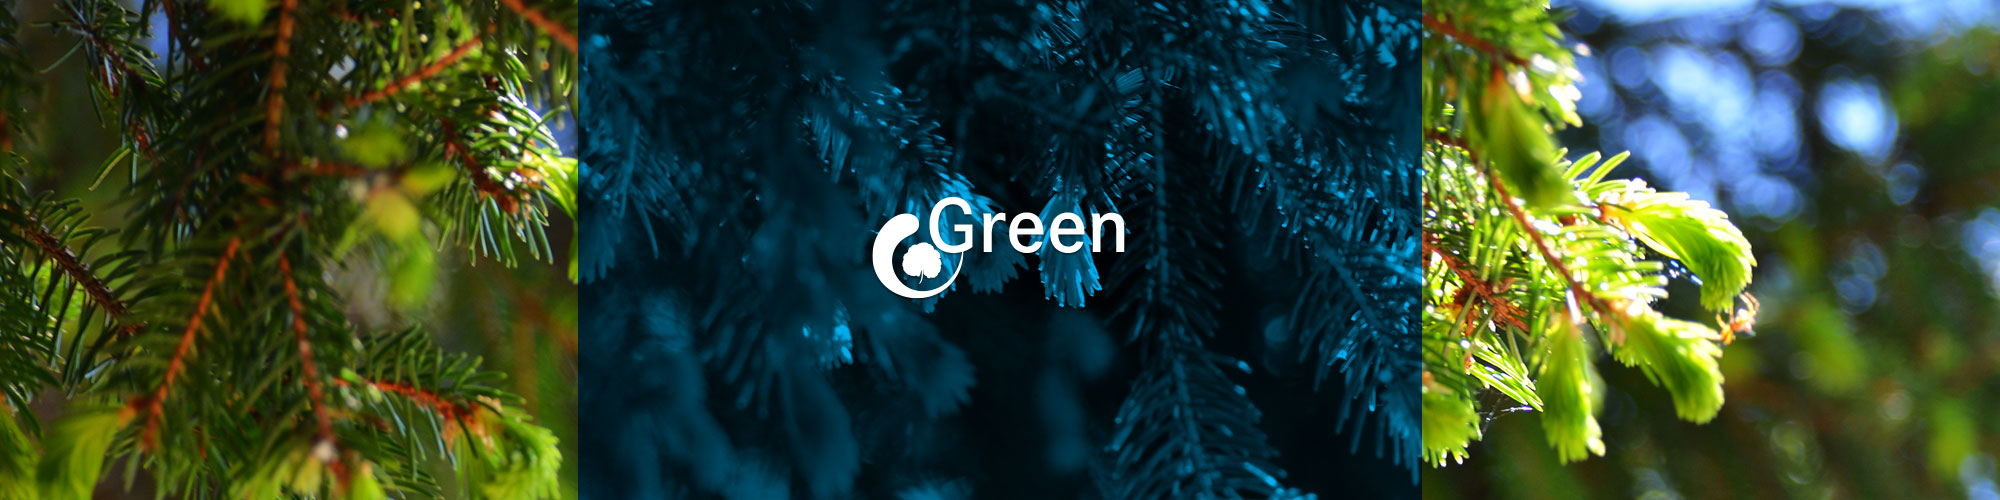 Ingeea Green